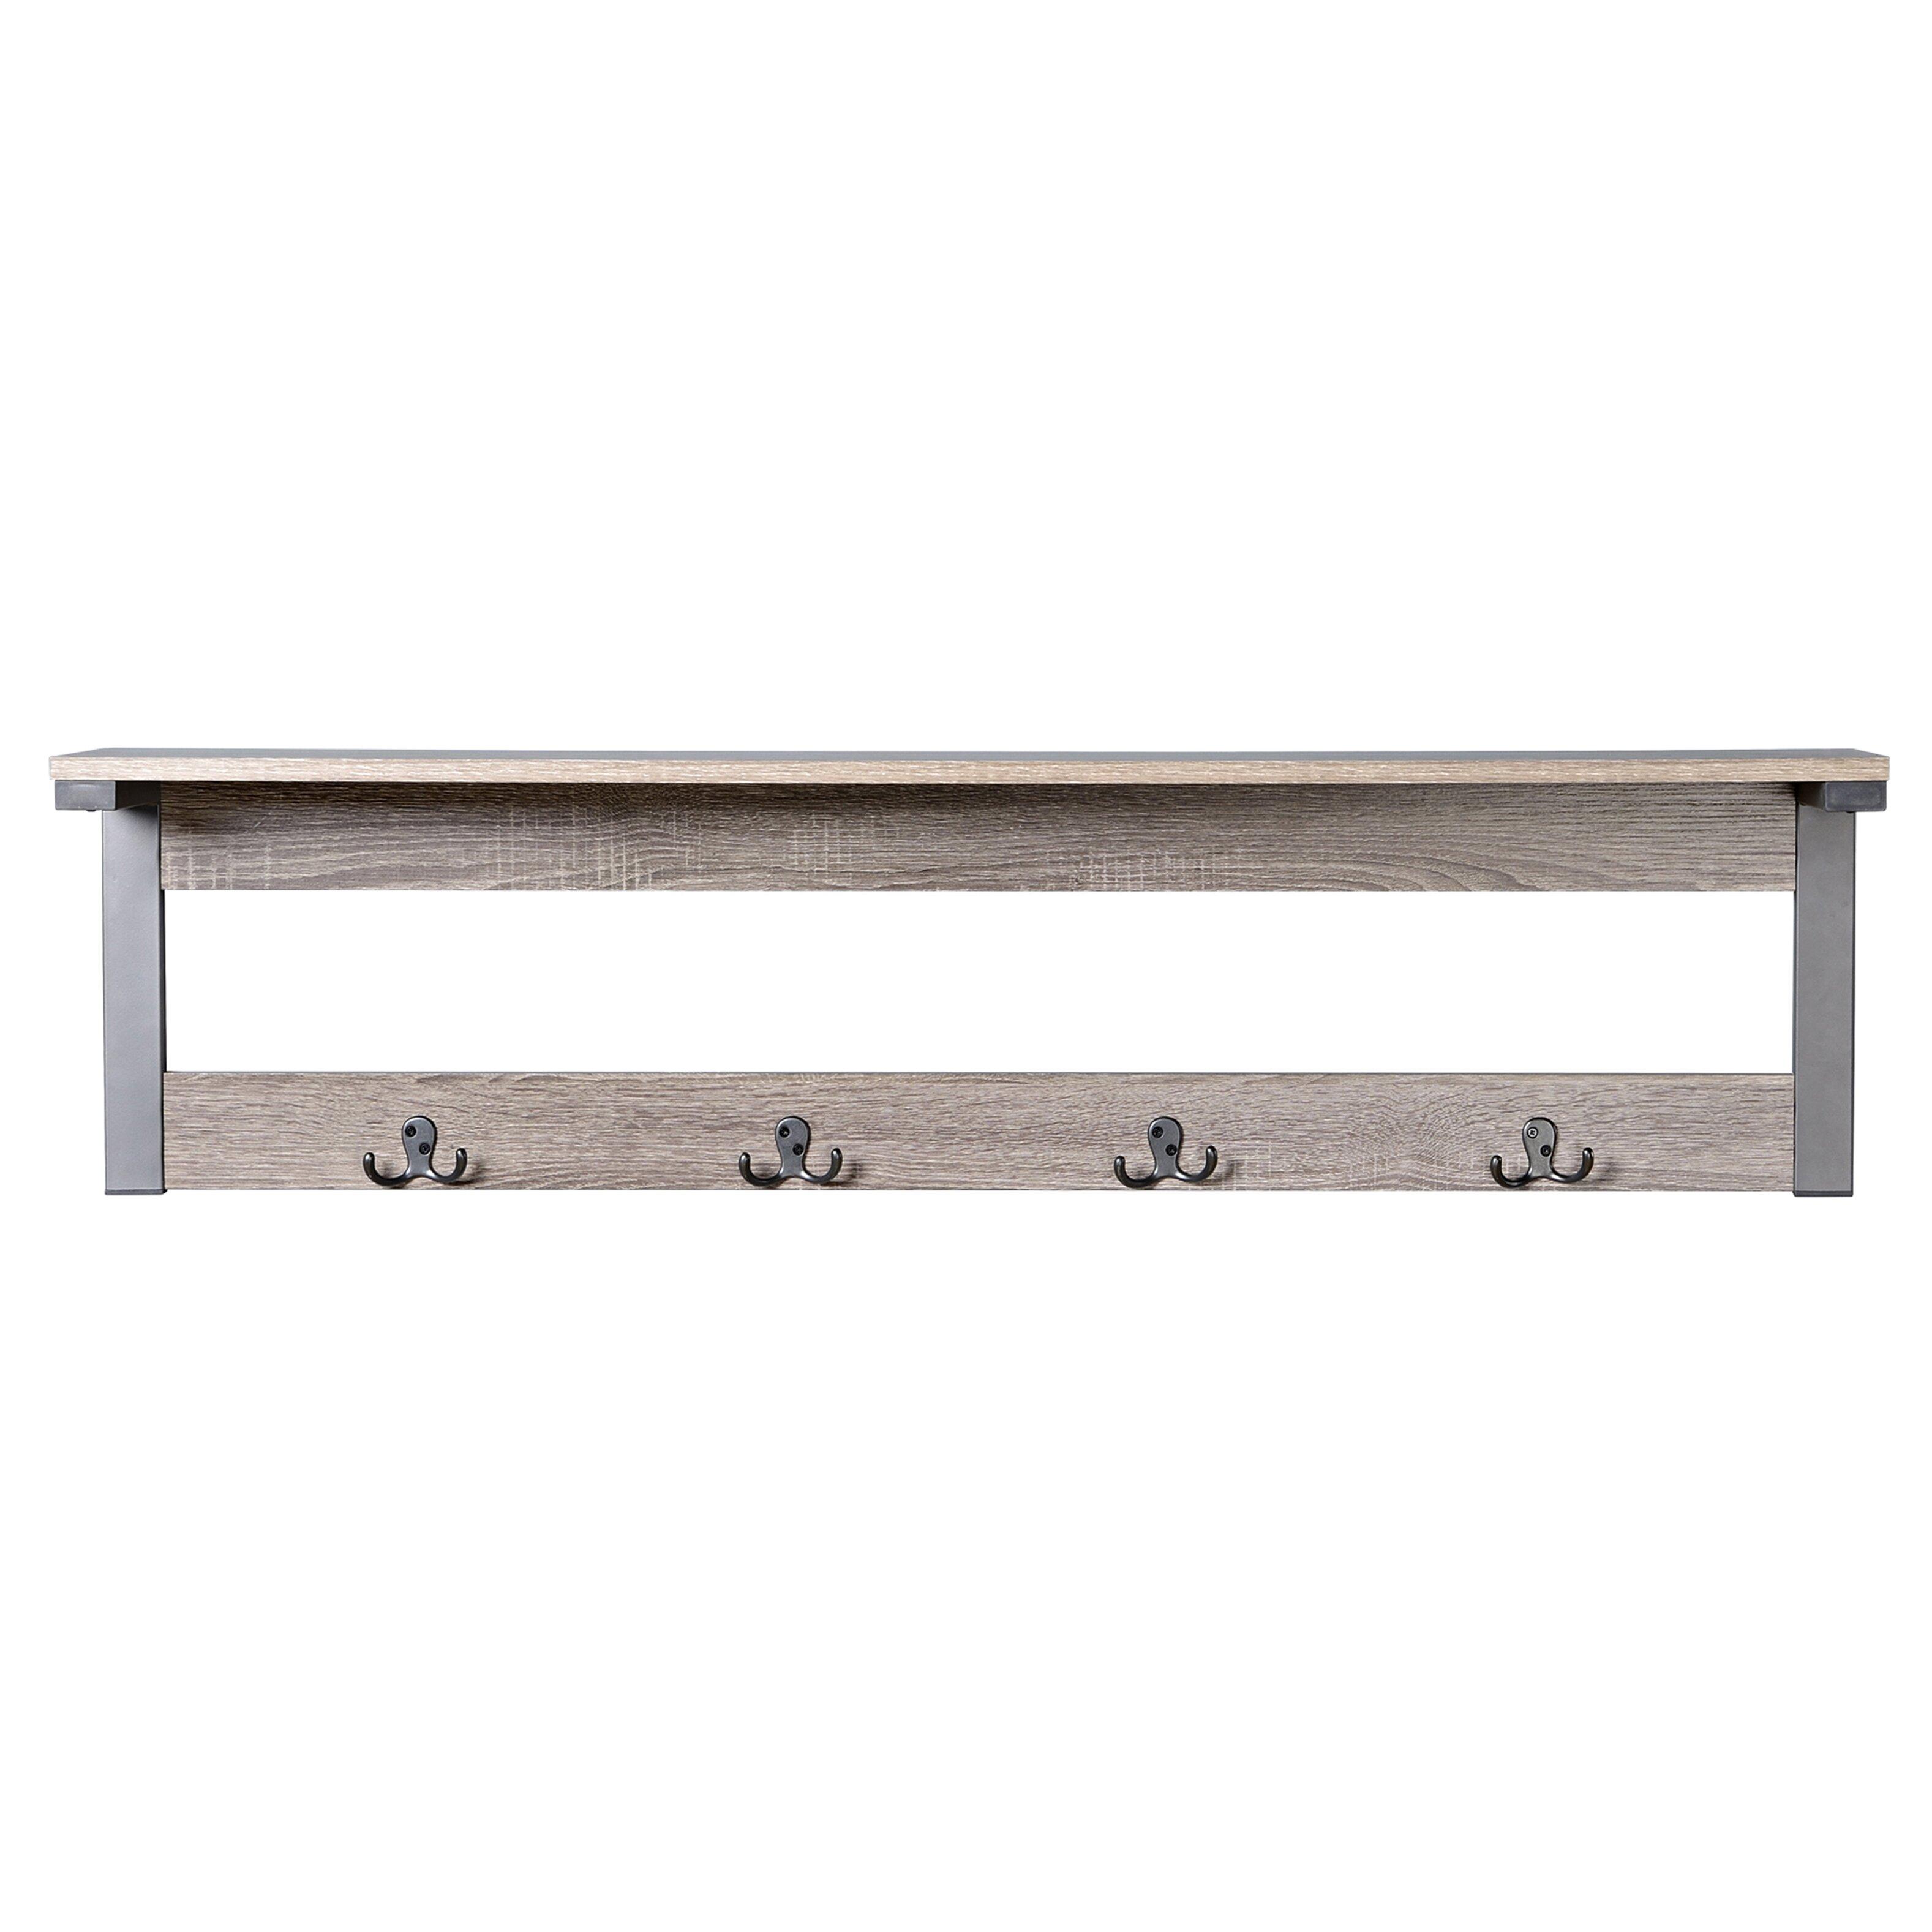 homestar 1 shelf 4 hook entryway wall mounted coat rack. Black Bedroom Furniture Sets. Home Design Ideas